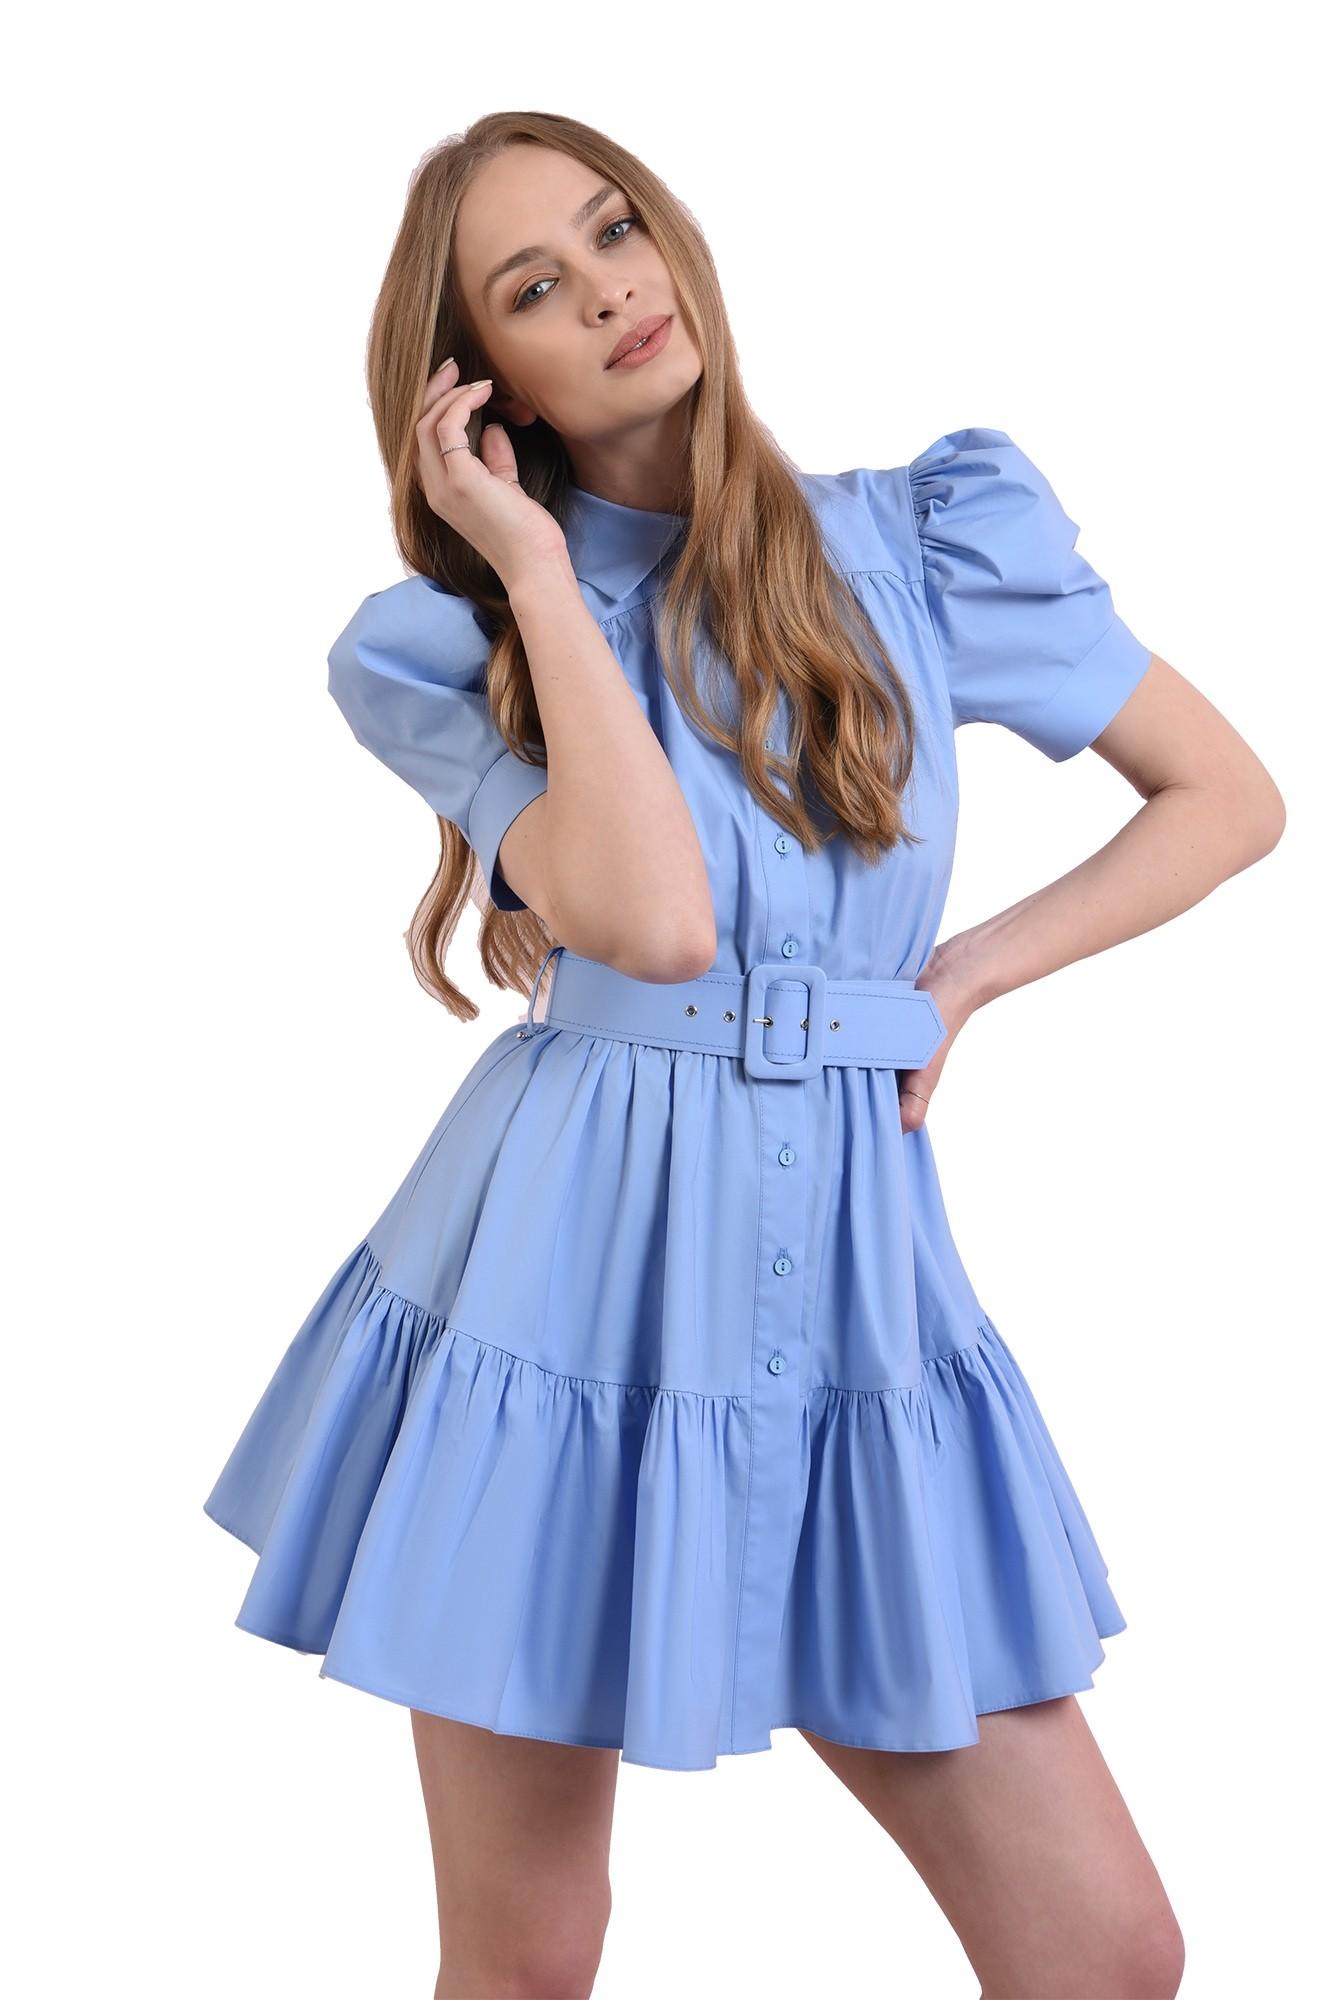 rochie evazata, cu centura, cu maneca voluminoasa